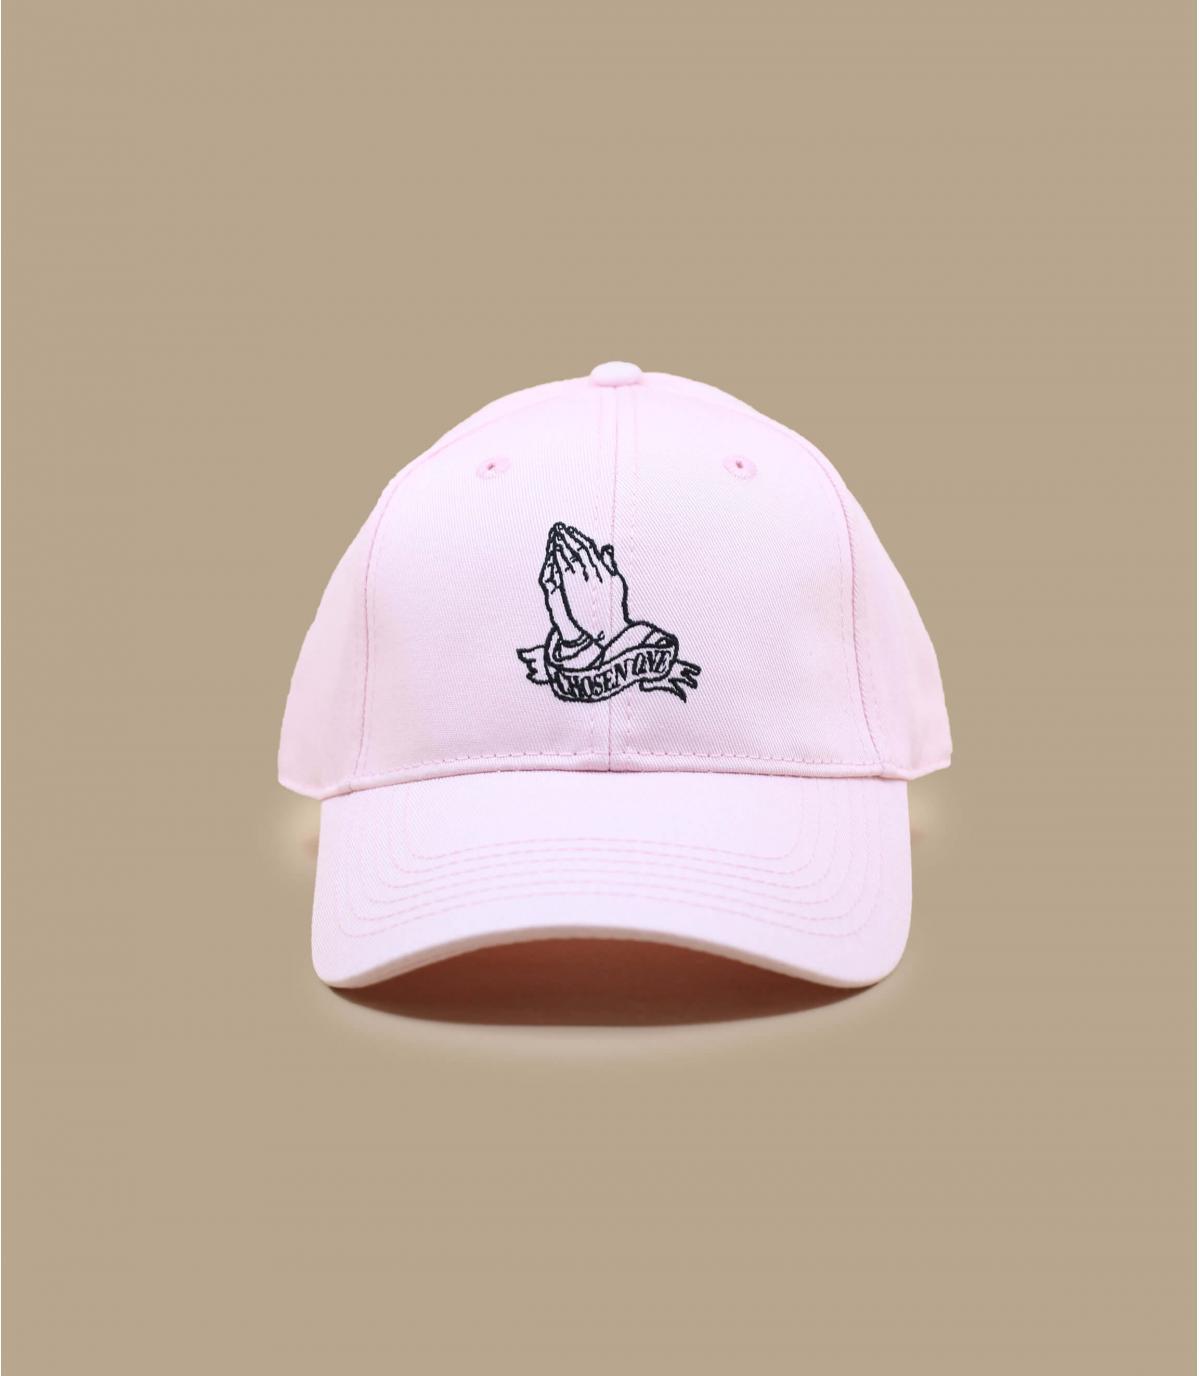 Dettagli Chosen One Curved Cap pale pink - image 2